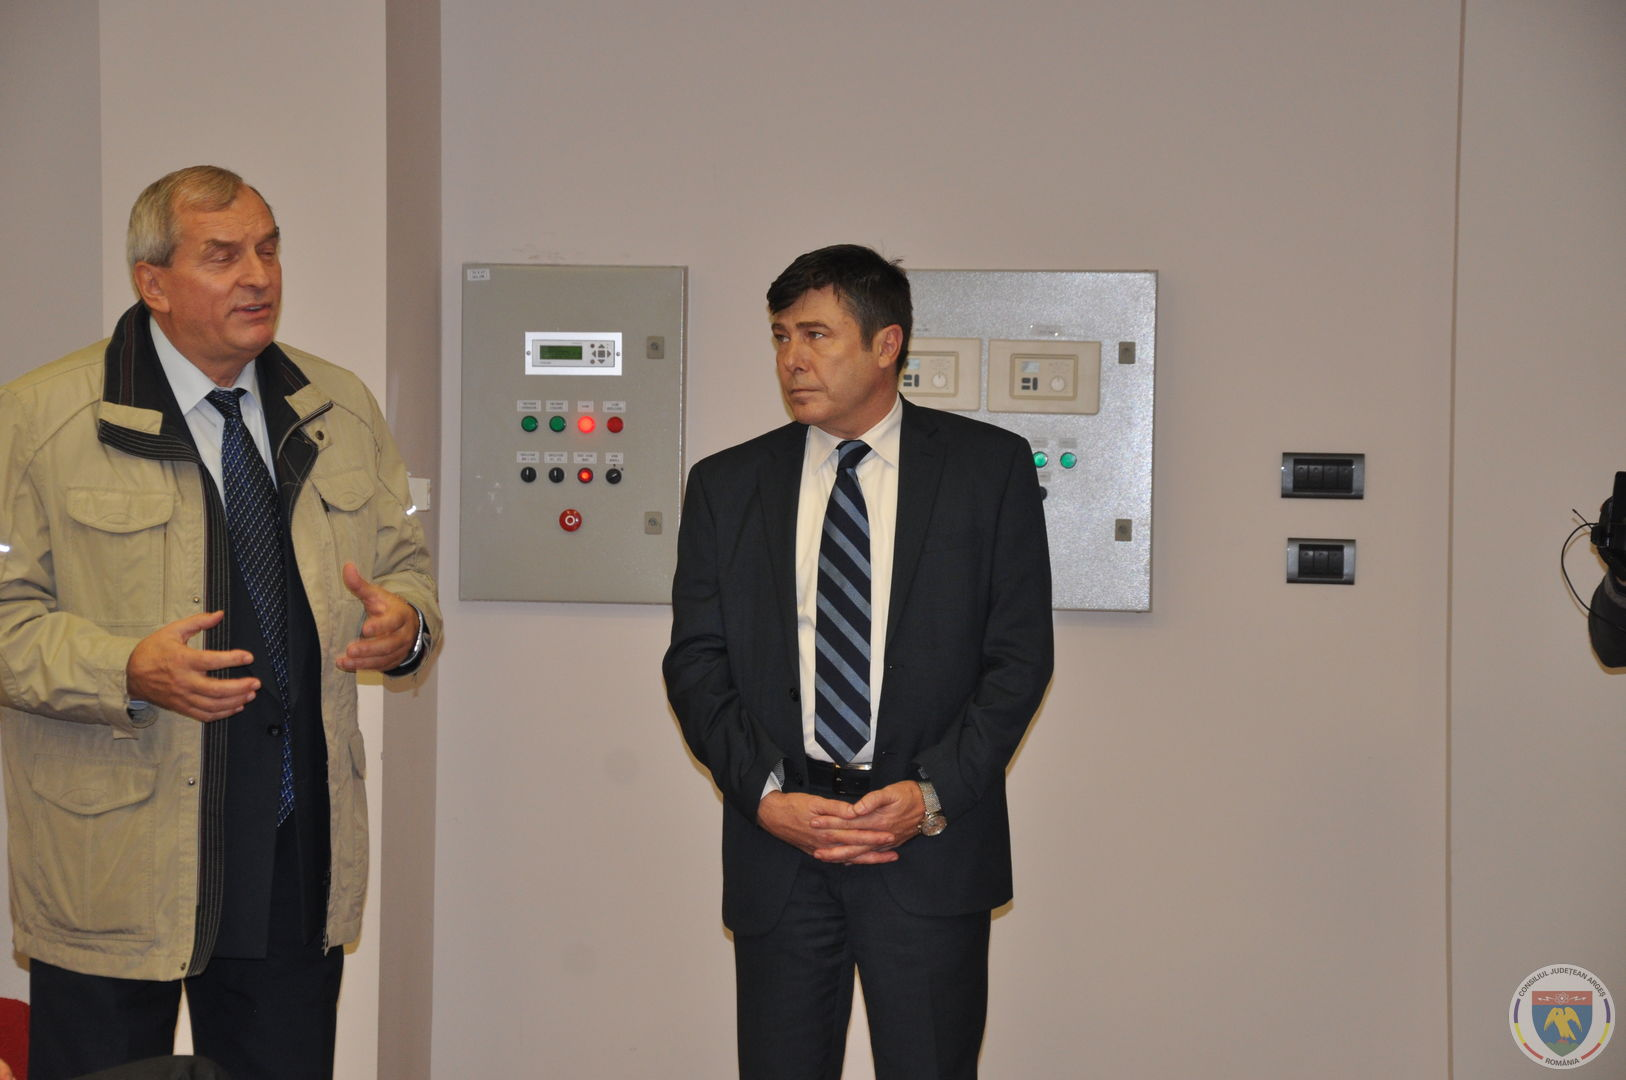 Conferinta Ministrii Teodorovici & Jianu 11.11.2014 (10).JPG